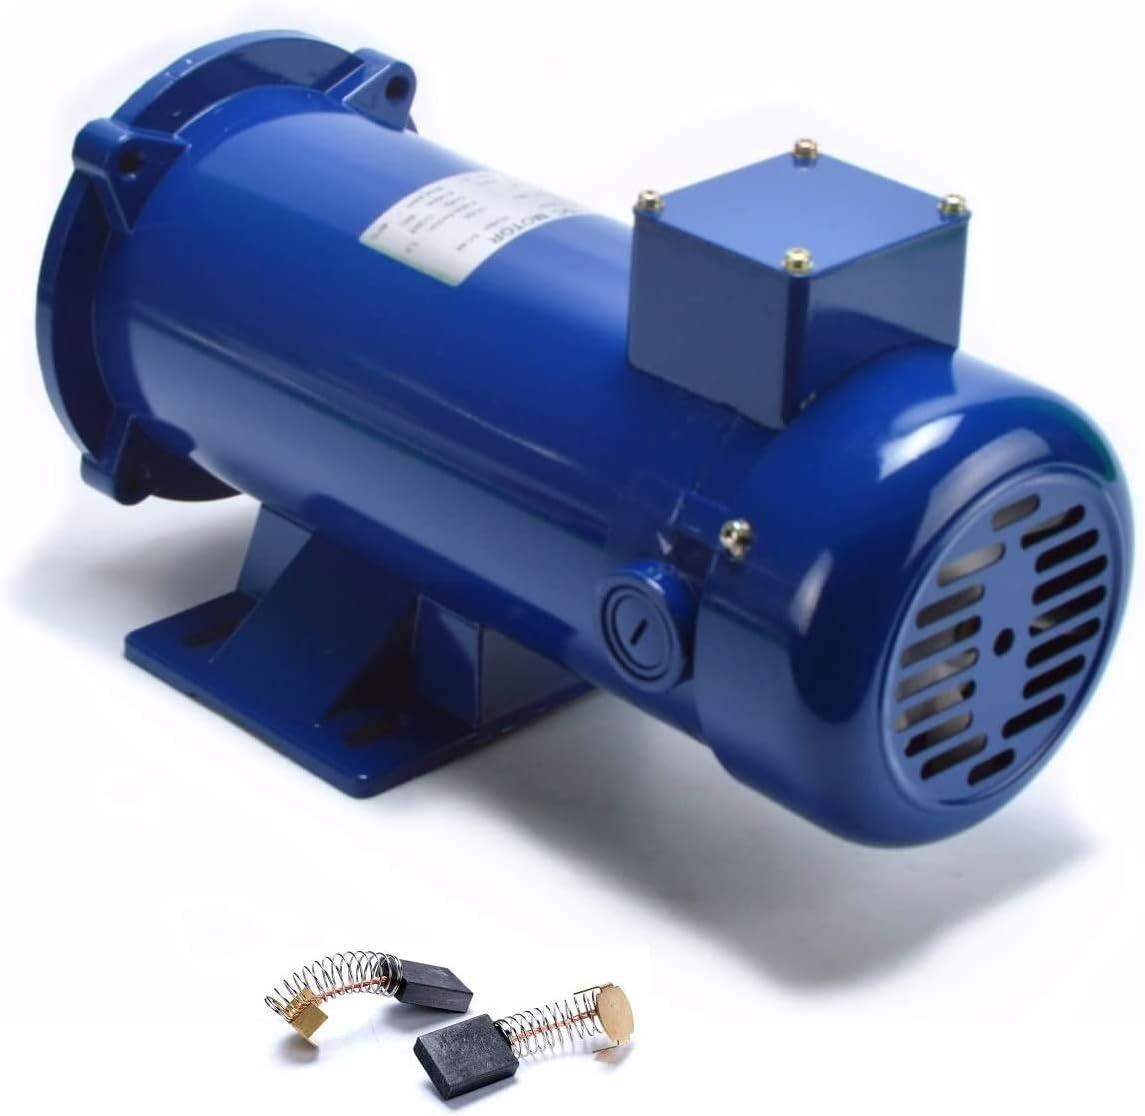 Yaetek Permanent Magnet Dc Motor, Tenv, 1/2hp, 56c, 90v/1750rpm